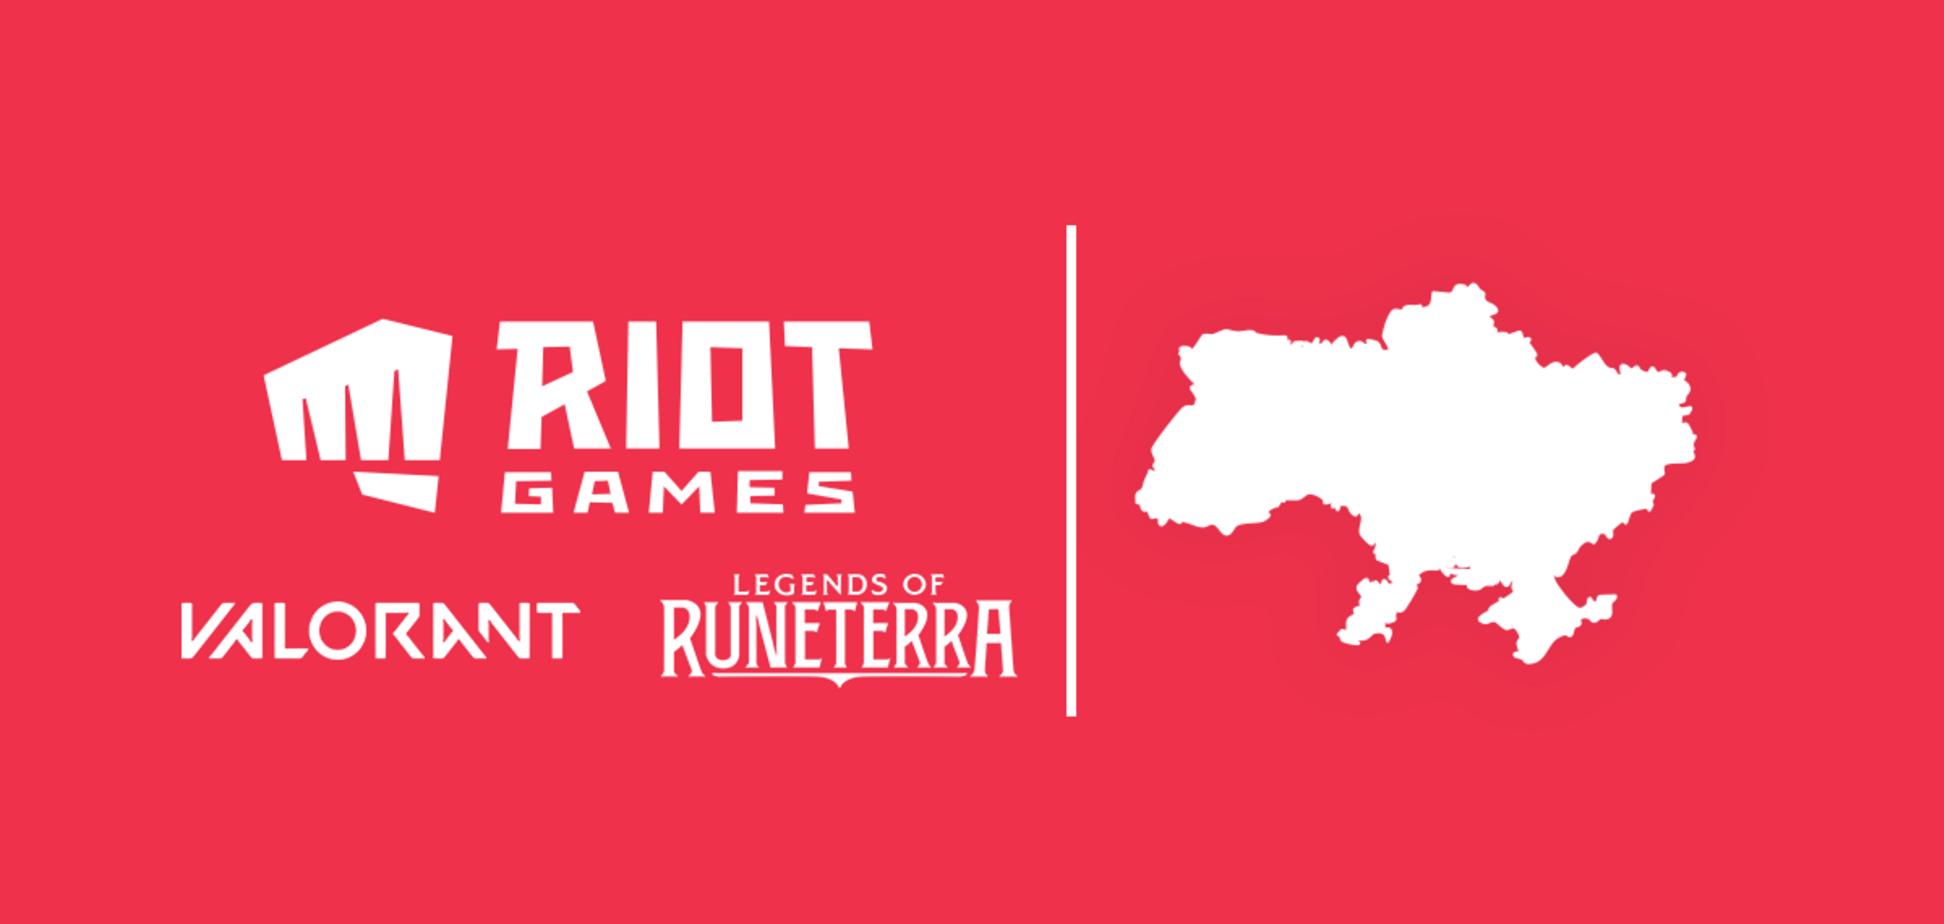 Riot Games и LeoGaming запускают прием платежей по VALORANT и Legends of Runeterra в Украине